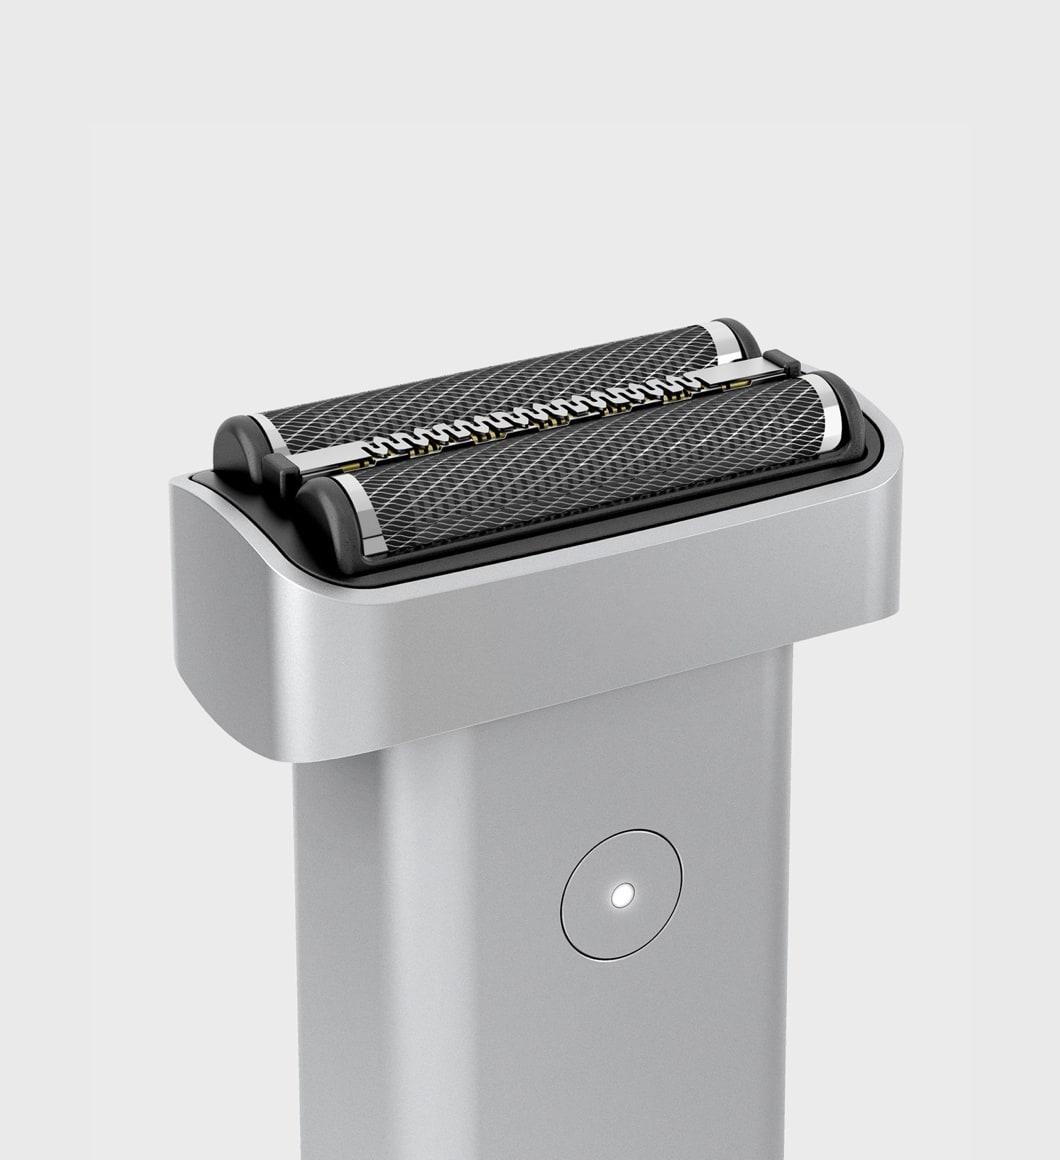 Apple Watch Series 4 (GPS, 372mm) - Space Gray